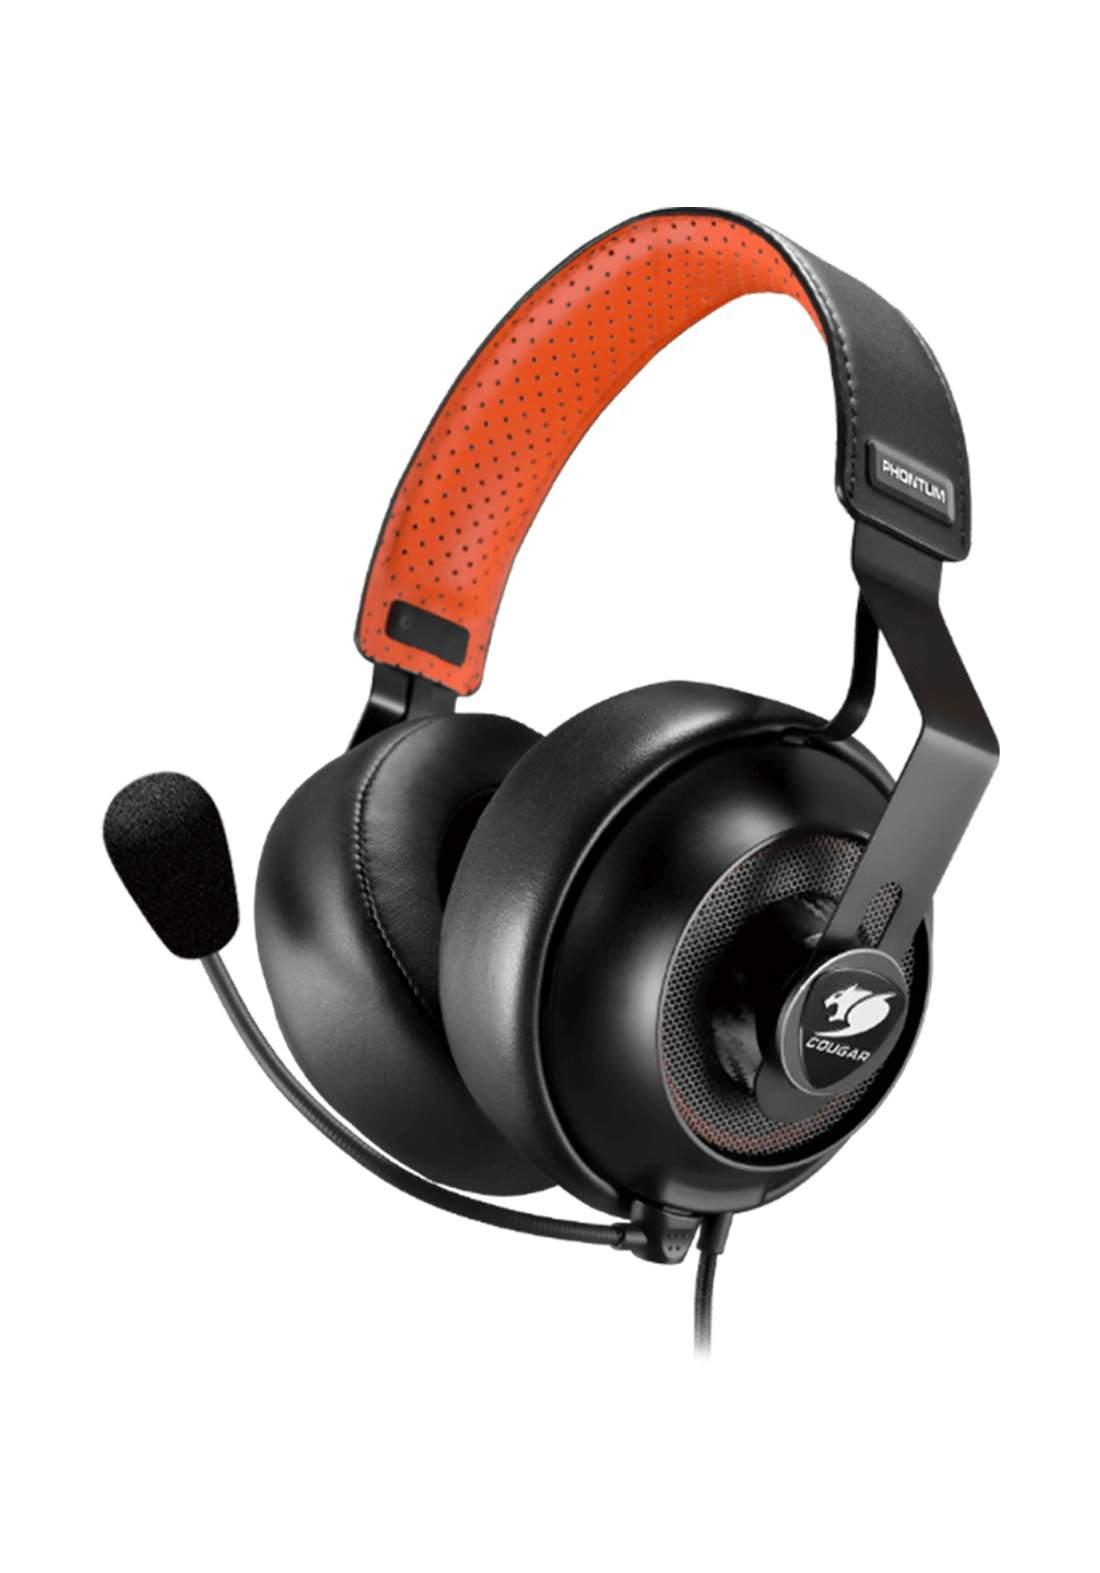 Cougar Phontum S Gaming Headset - Black سماعة سلكية